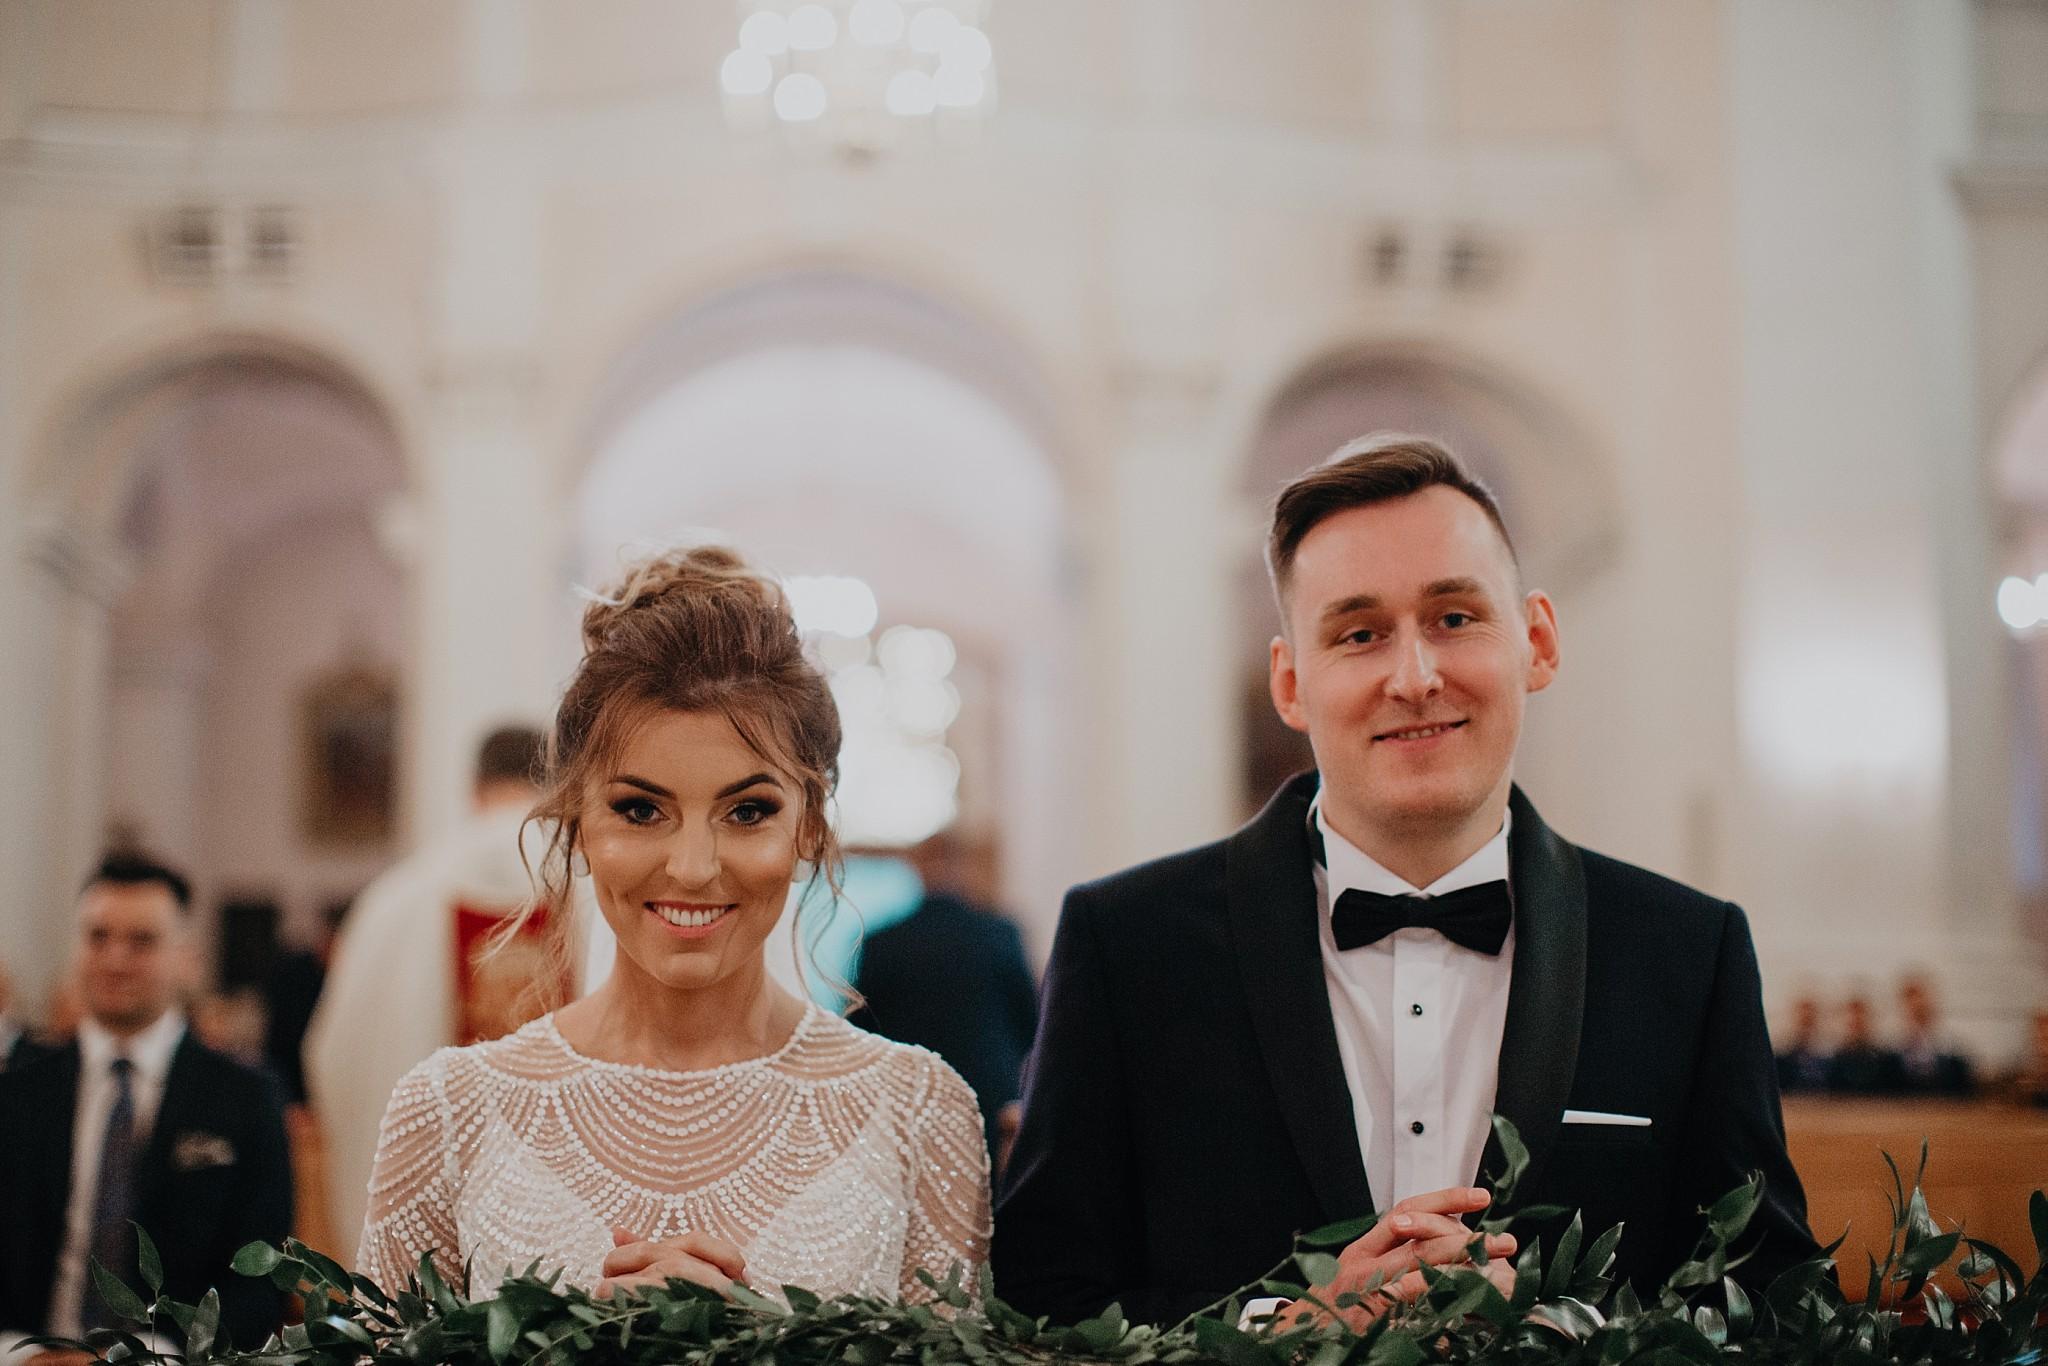 fotograf poznan wesele dobra truskawka piekne wesele pod poznaniem wesele w dobrej truskawce piekna para mloda slub marzen slub koronawirus slub listopad wesele koronawirus 197